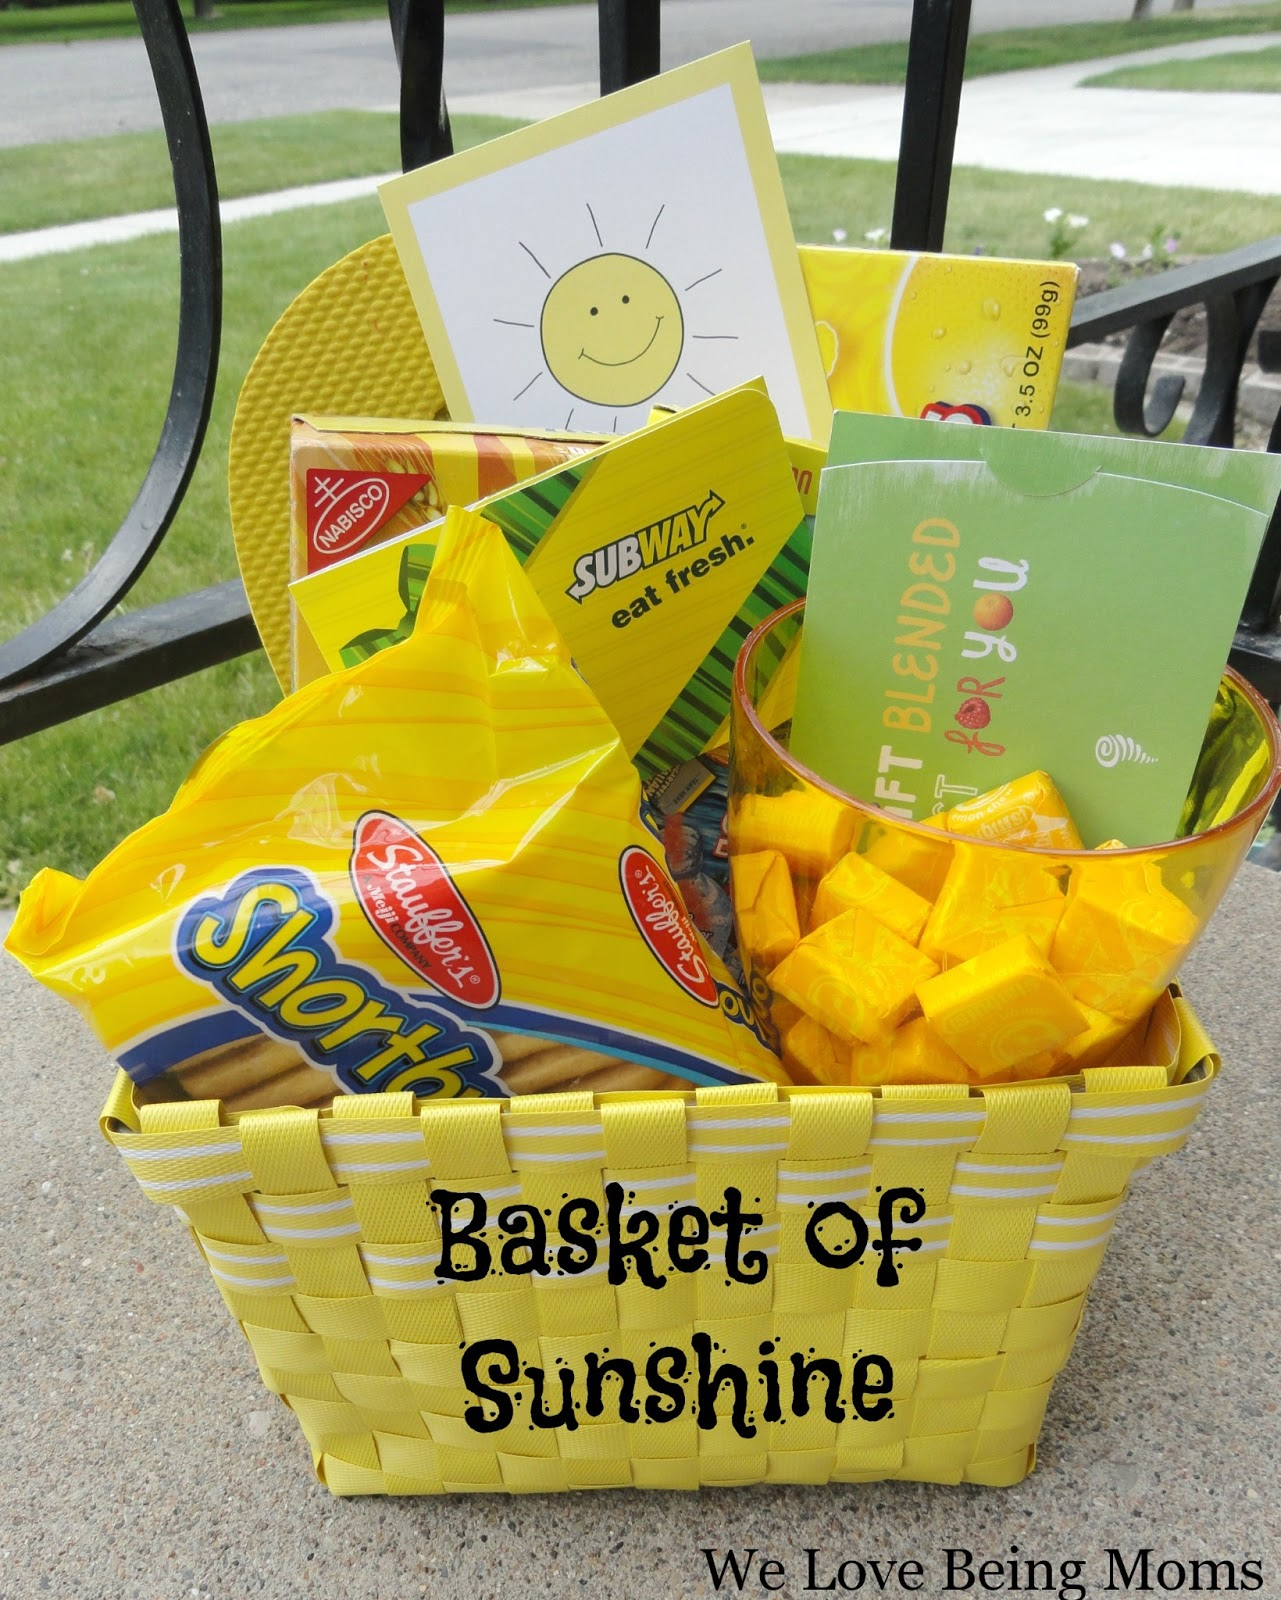 image regarding Basket of Sunshine Printable called We Take pleasure in Remaining Mothers!: Basket of Sun